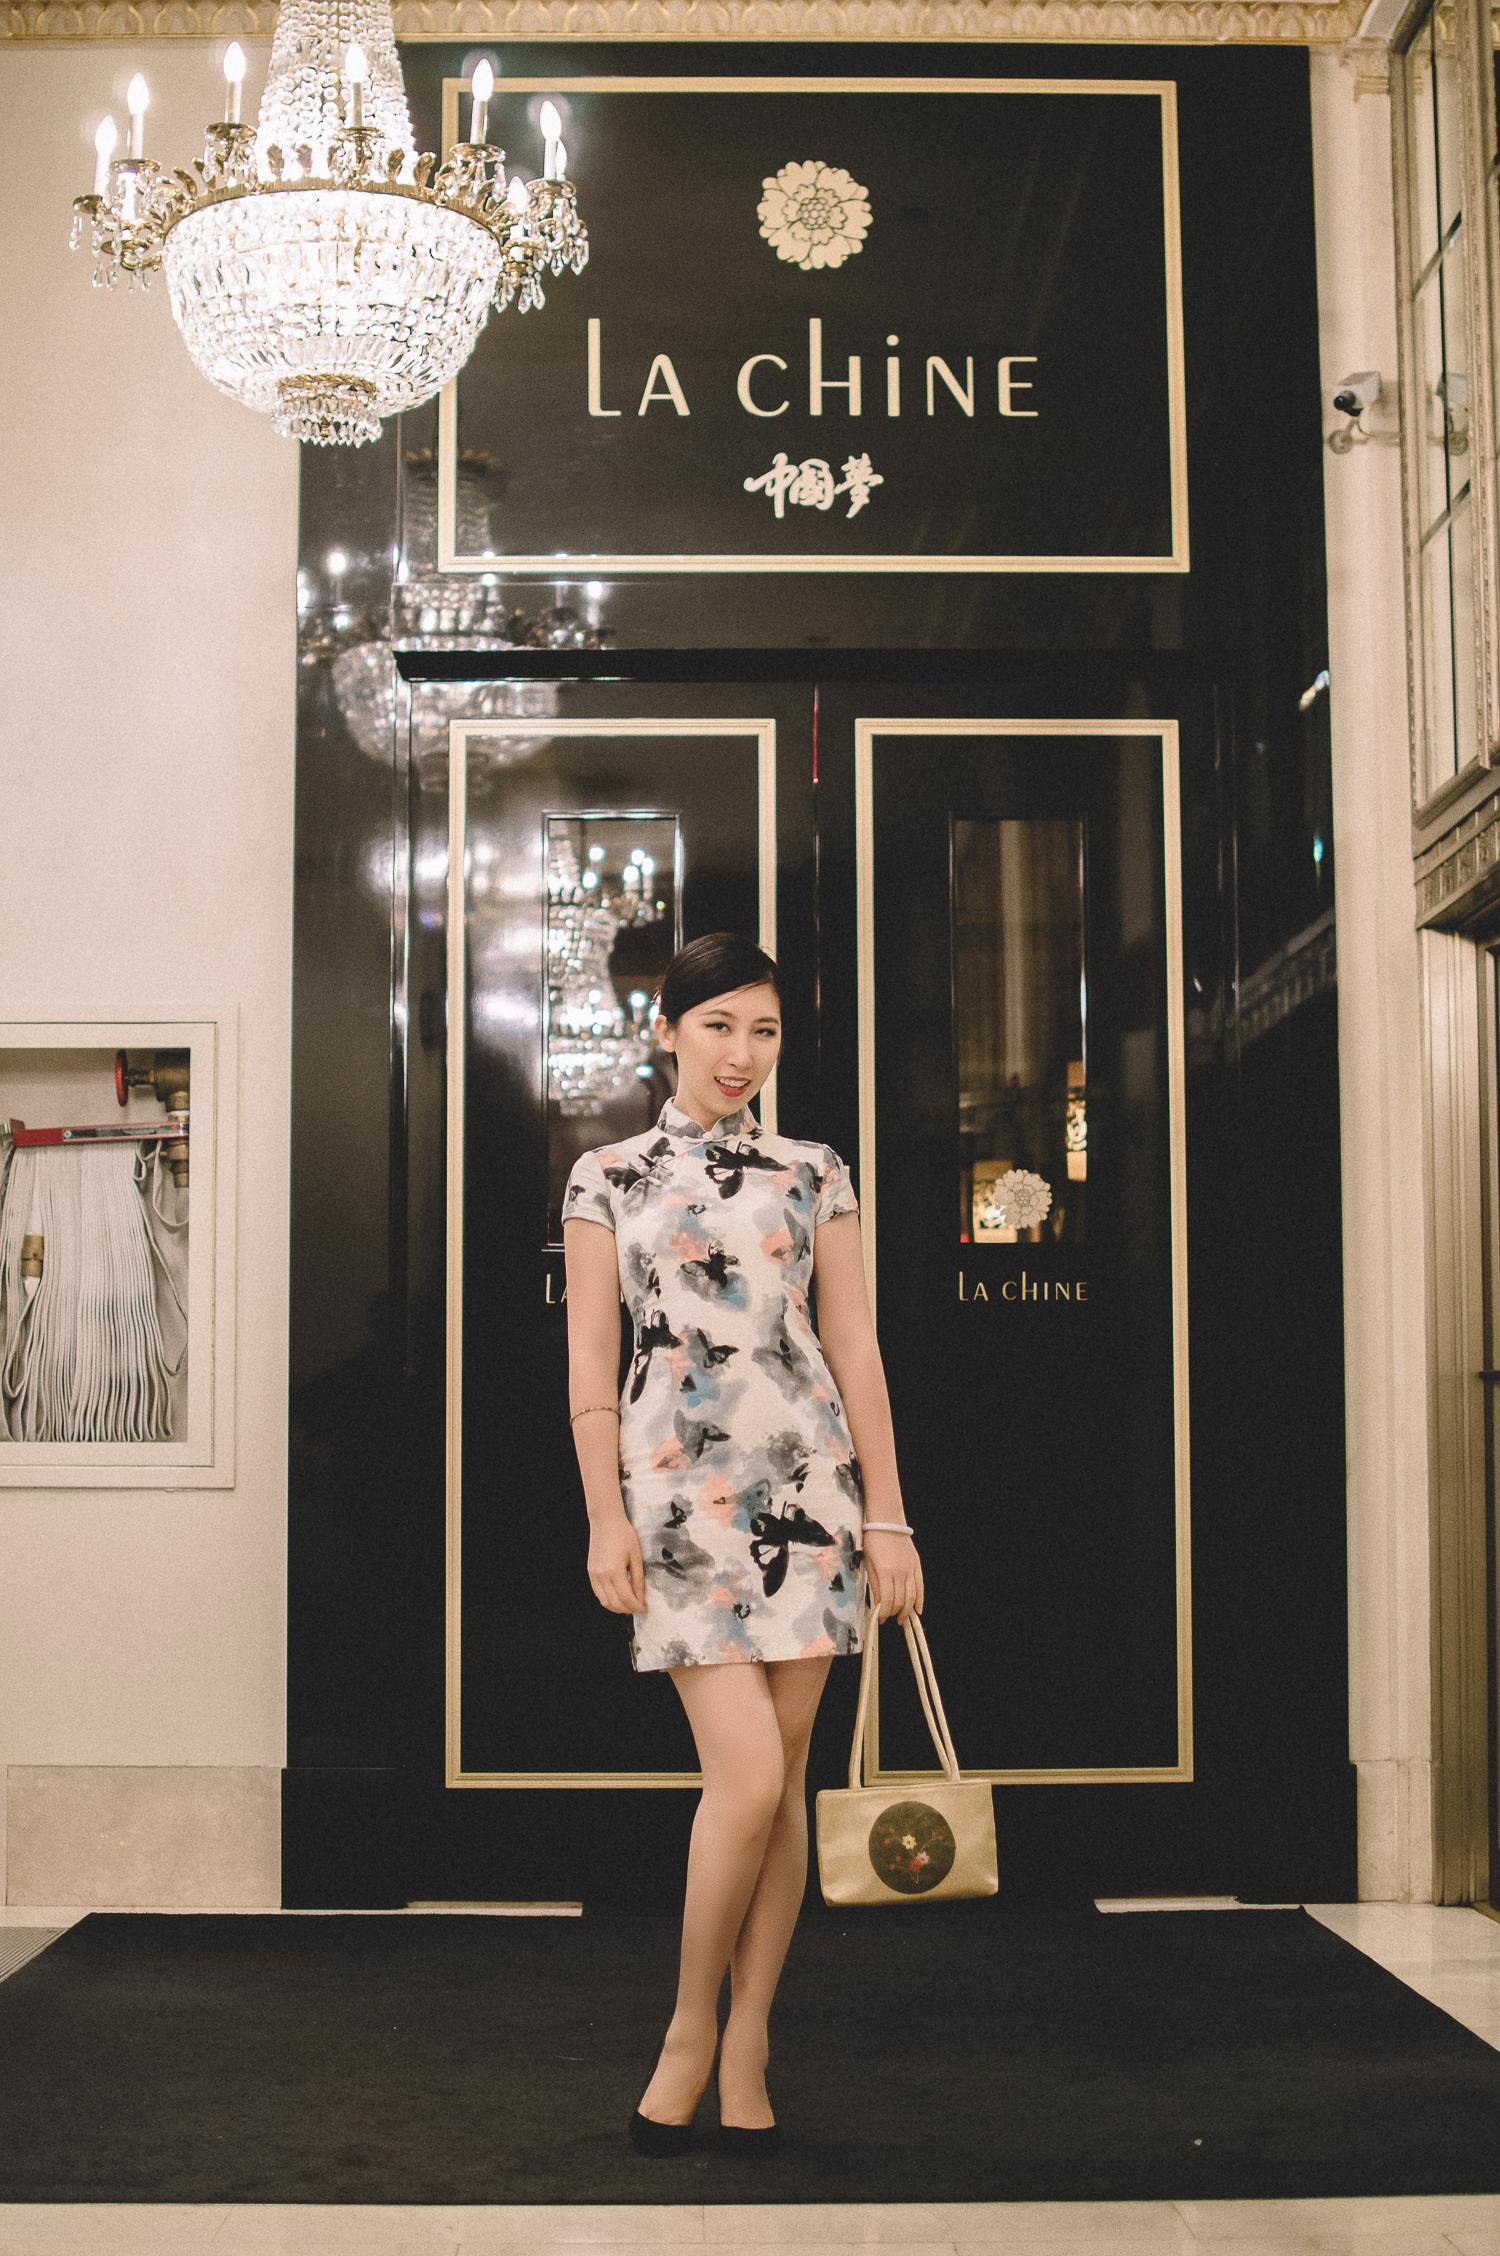 La Chine at Waldorf Astoria